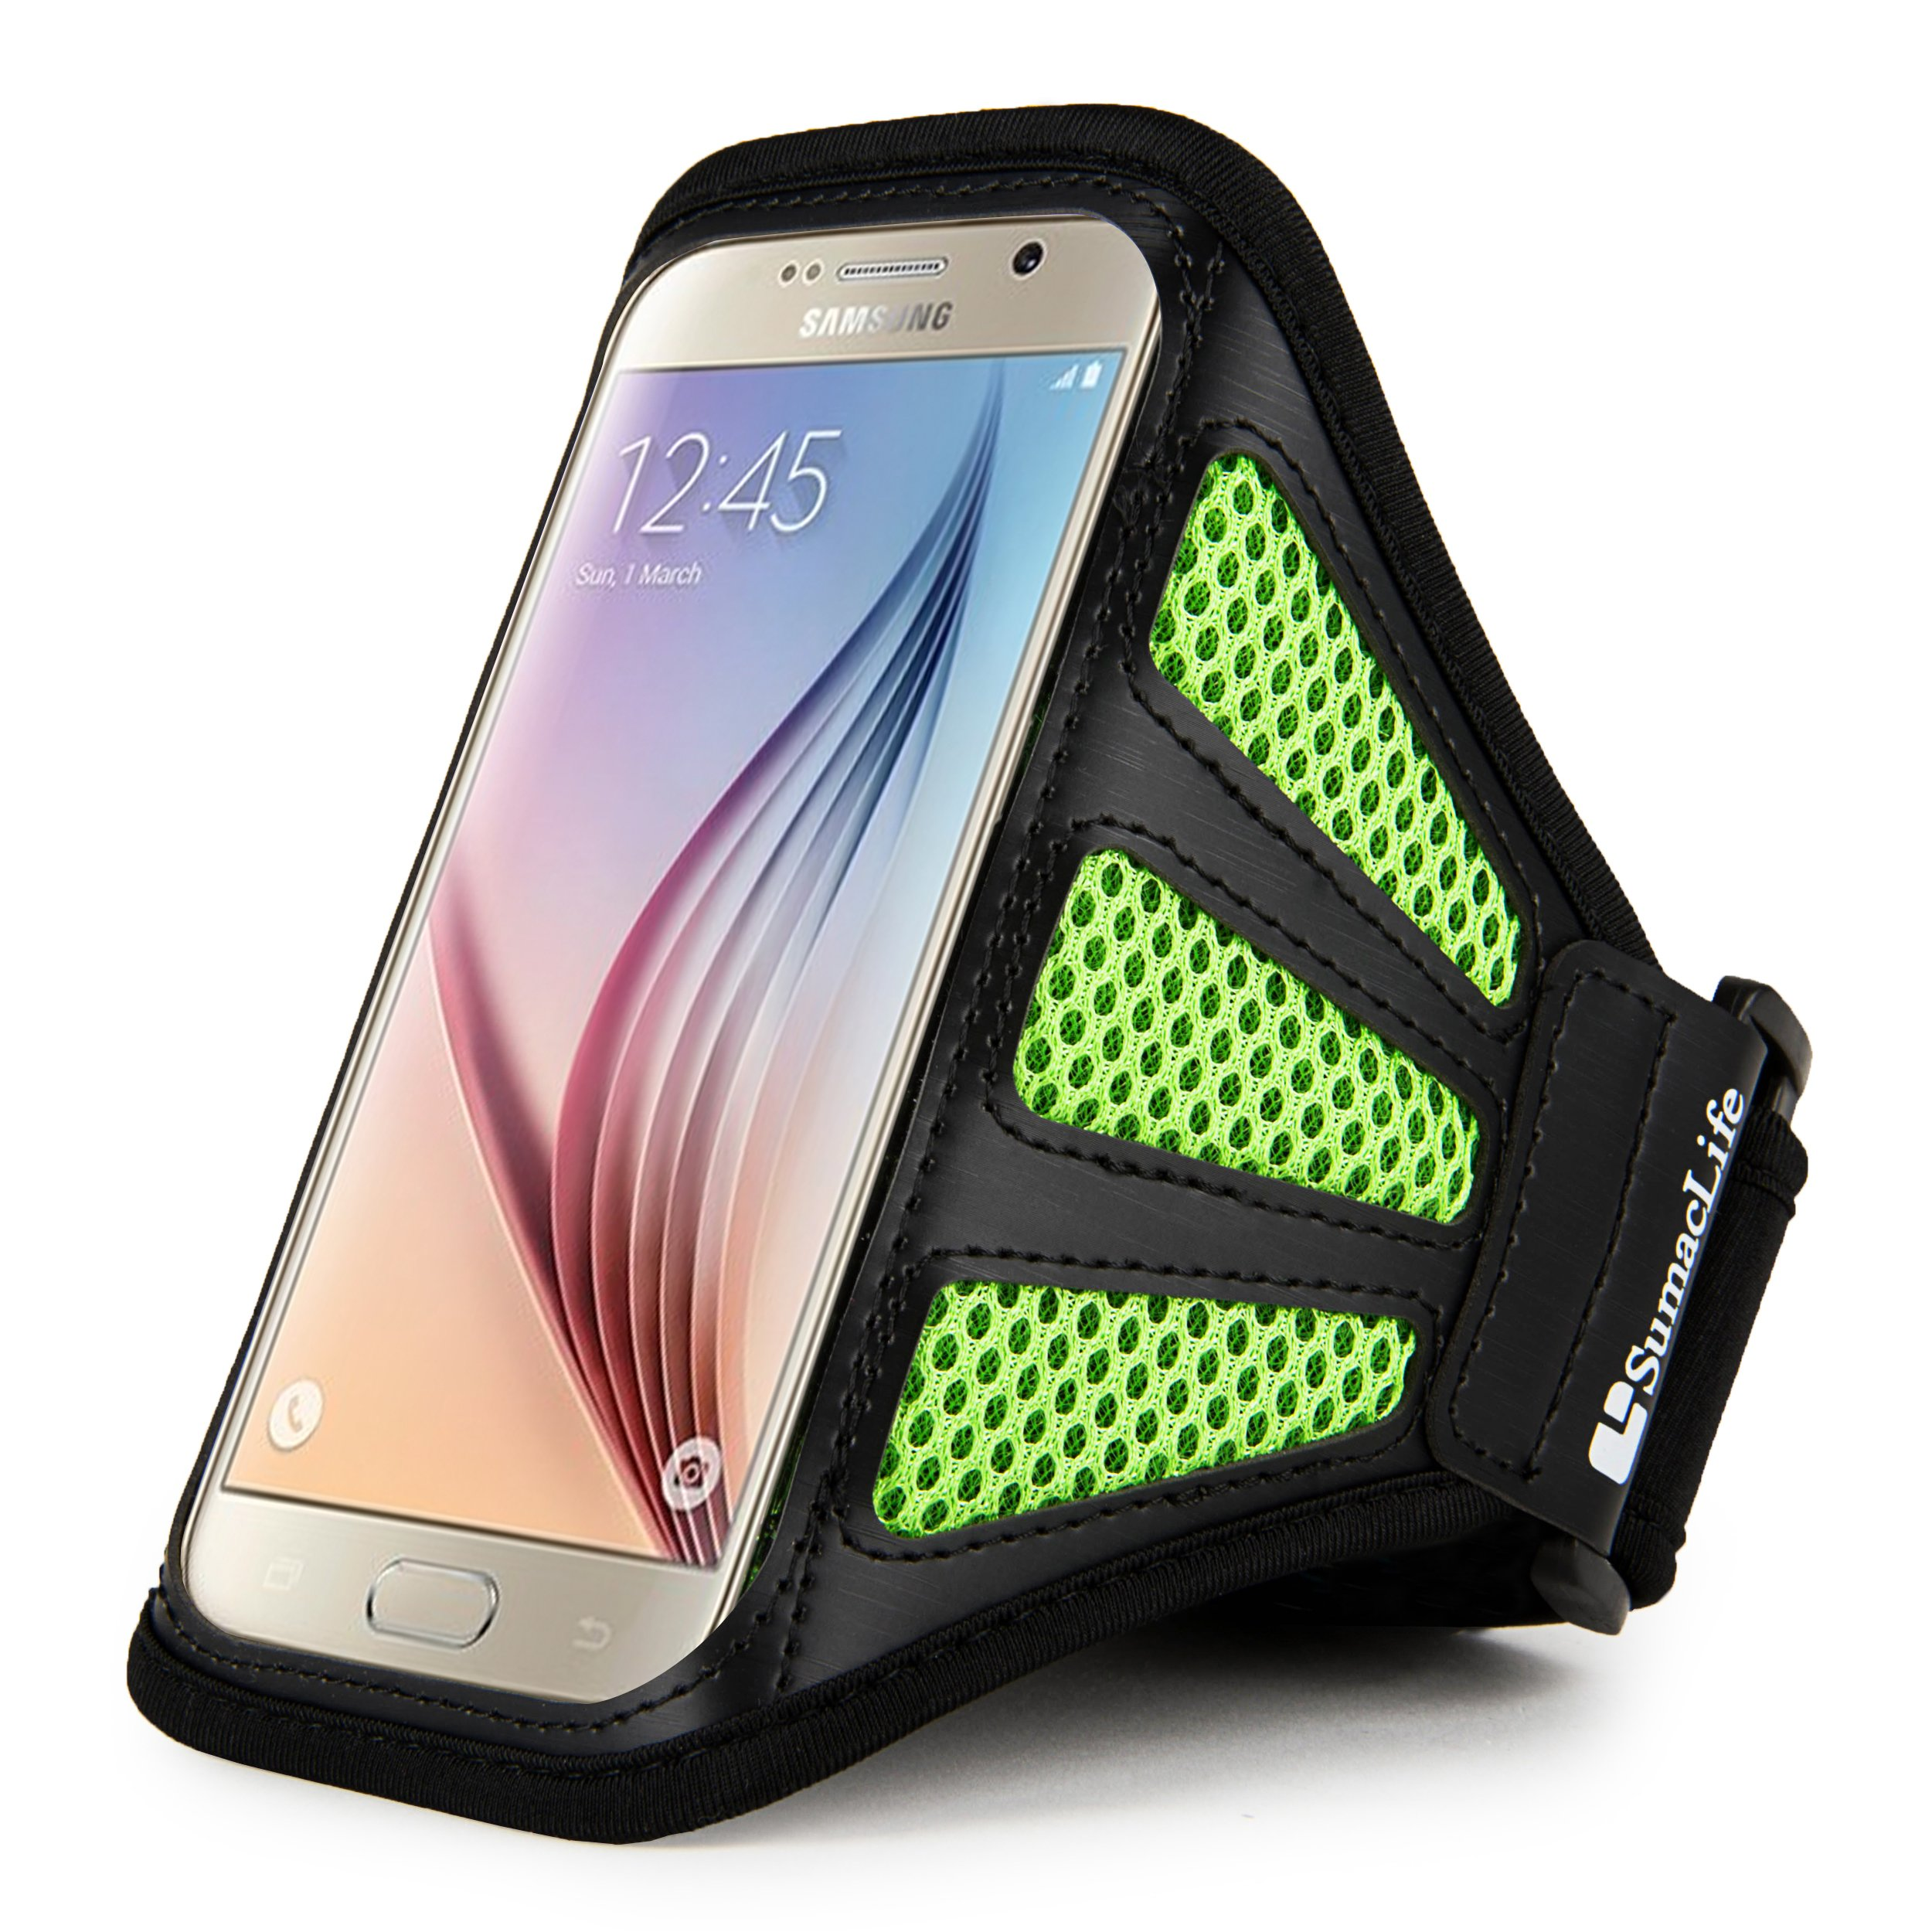 Sumaclife Fashion Mesh Sports Series Cellphone Armband Armlet for Samsung Galaxy J5 (2016) / Amp Prime/Amp 2 / S7 / S6 Edge / S6 / A5 / E5 (Green/Black)